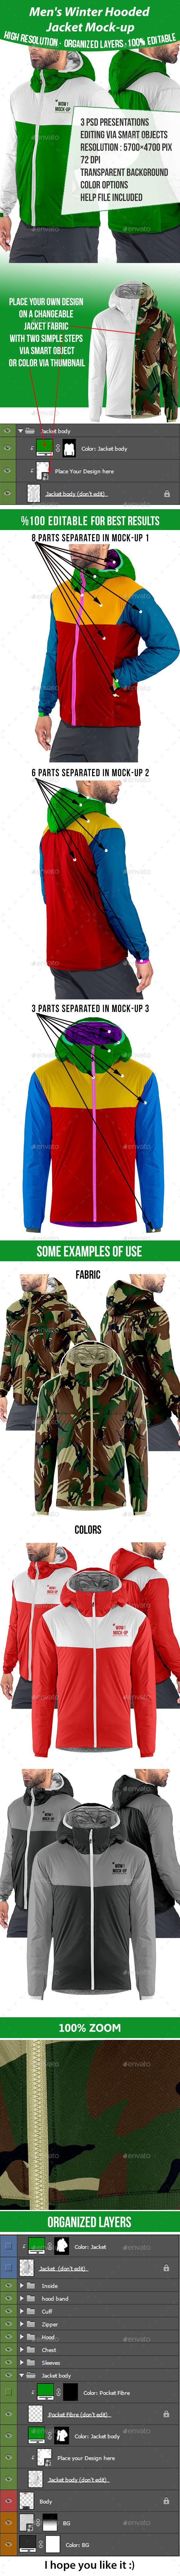 Download Men S Winter Hooded Jacket Mock Up Professional Customizable Clothing Mockup Design Identity Mockup Productdesig Men Winter Clothing Mockup Hooded Jacket